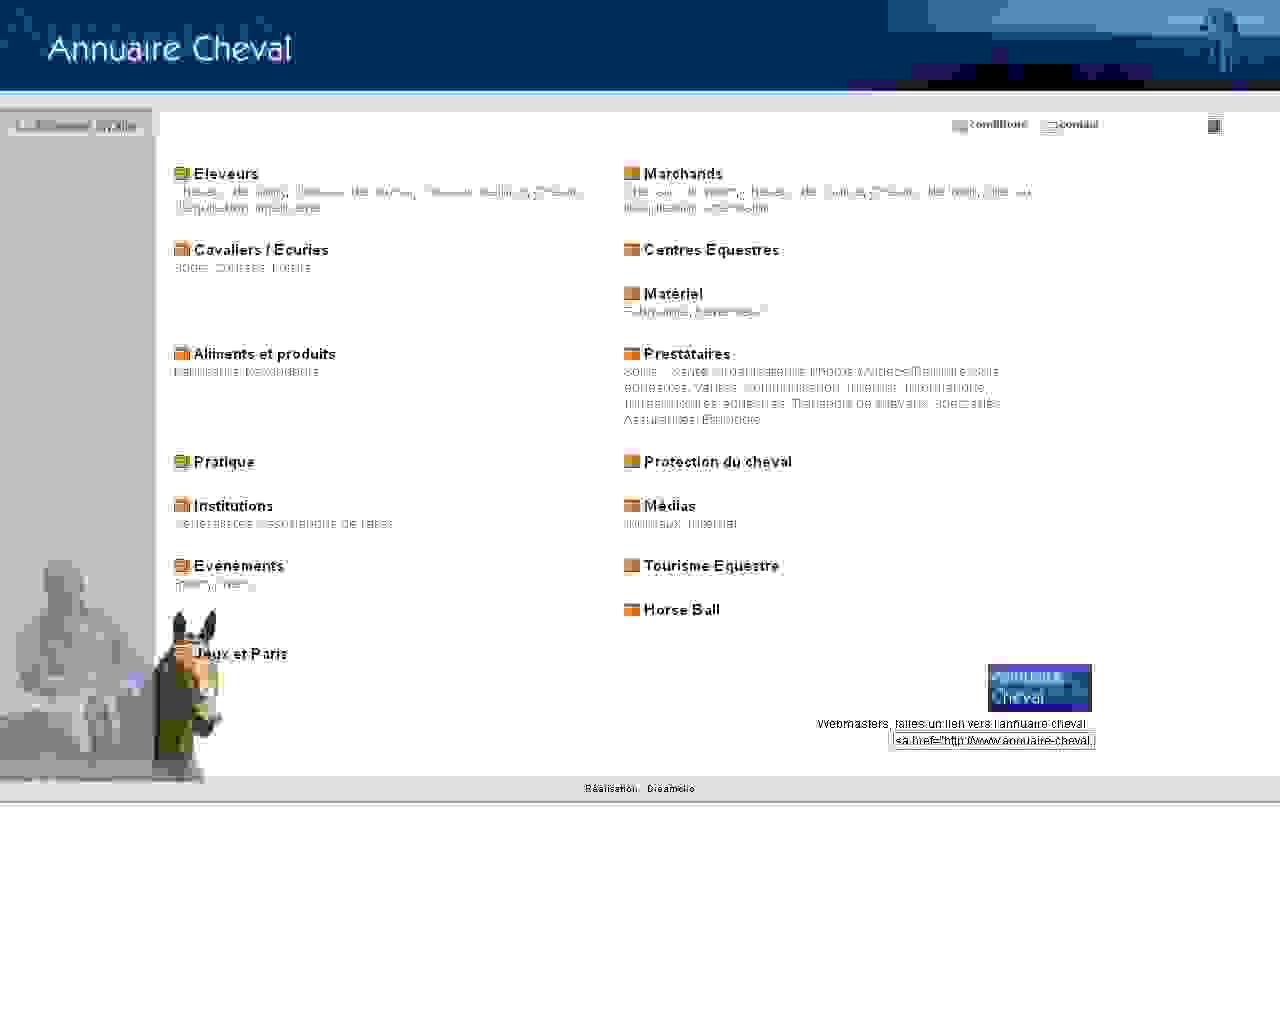 Visuel du site Annuaire Cheval